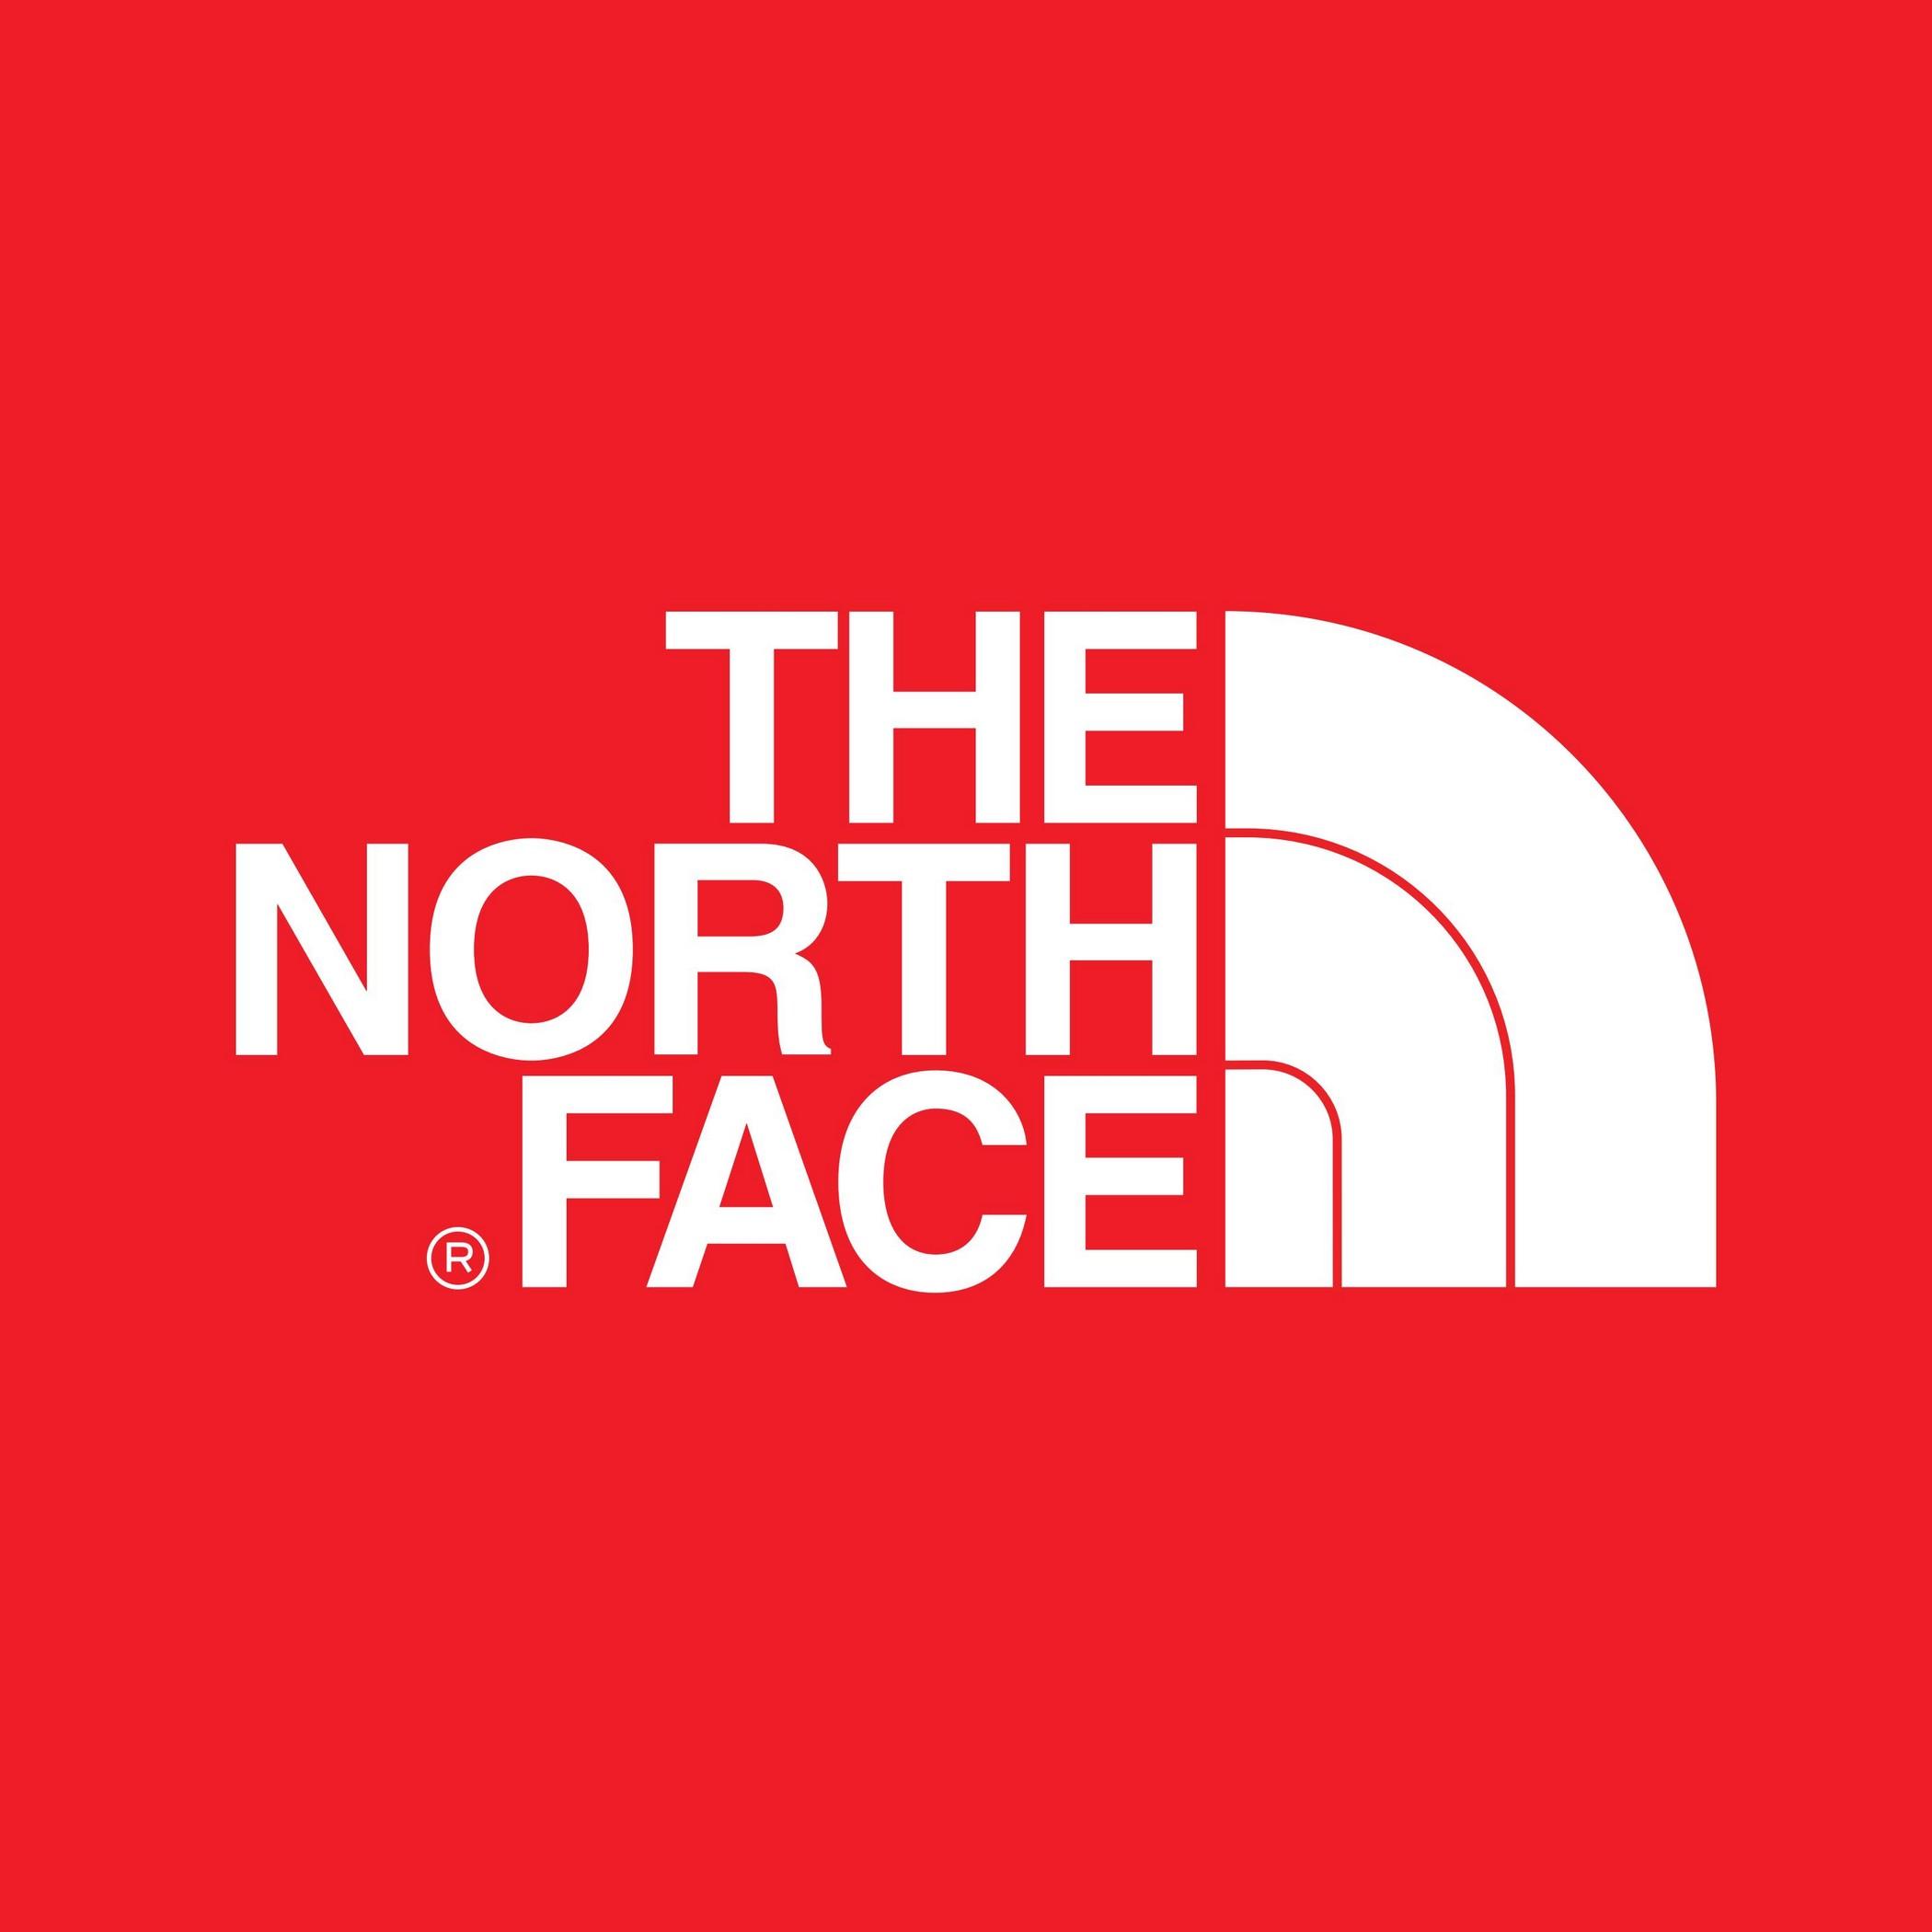 The North Fae.jpg